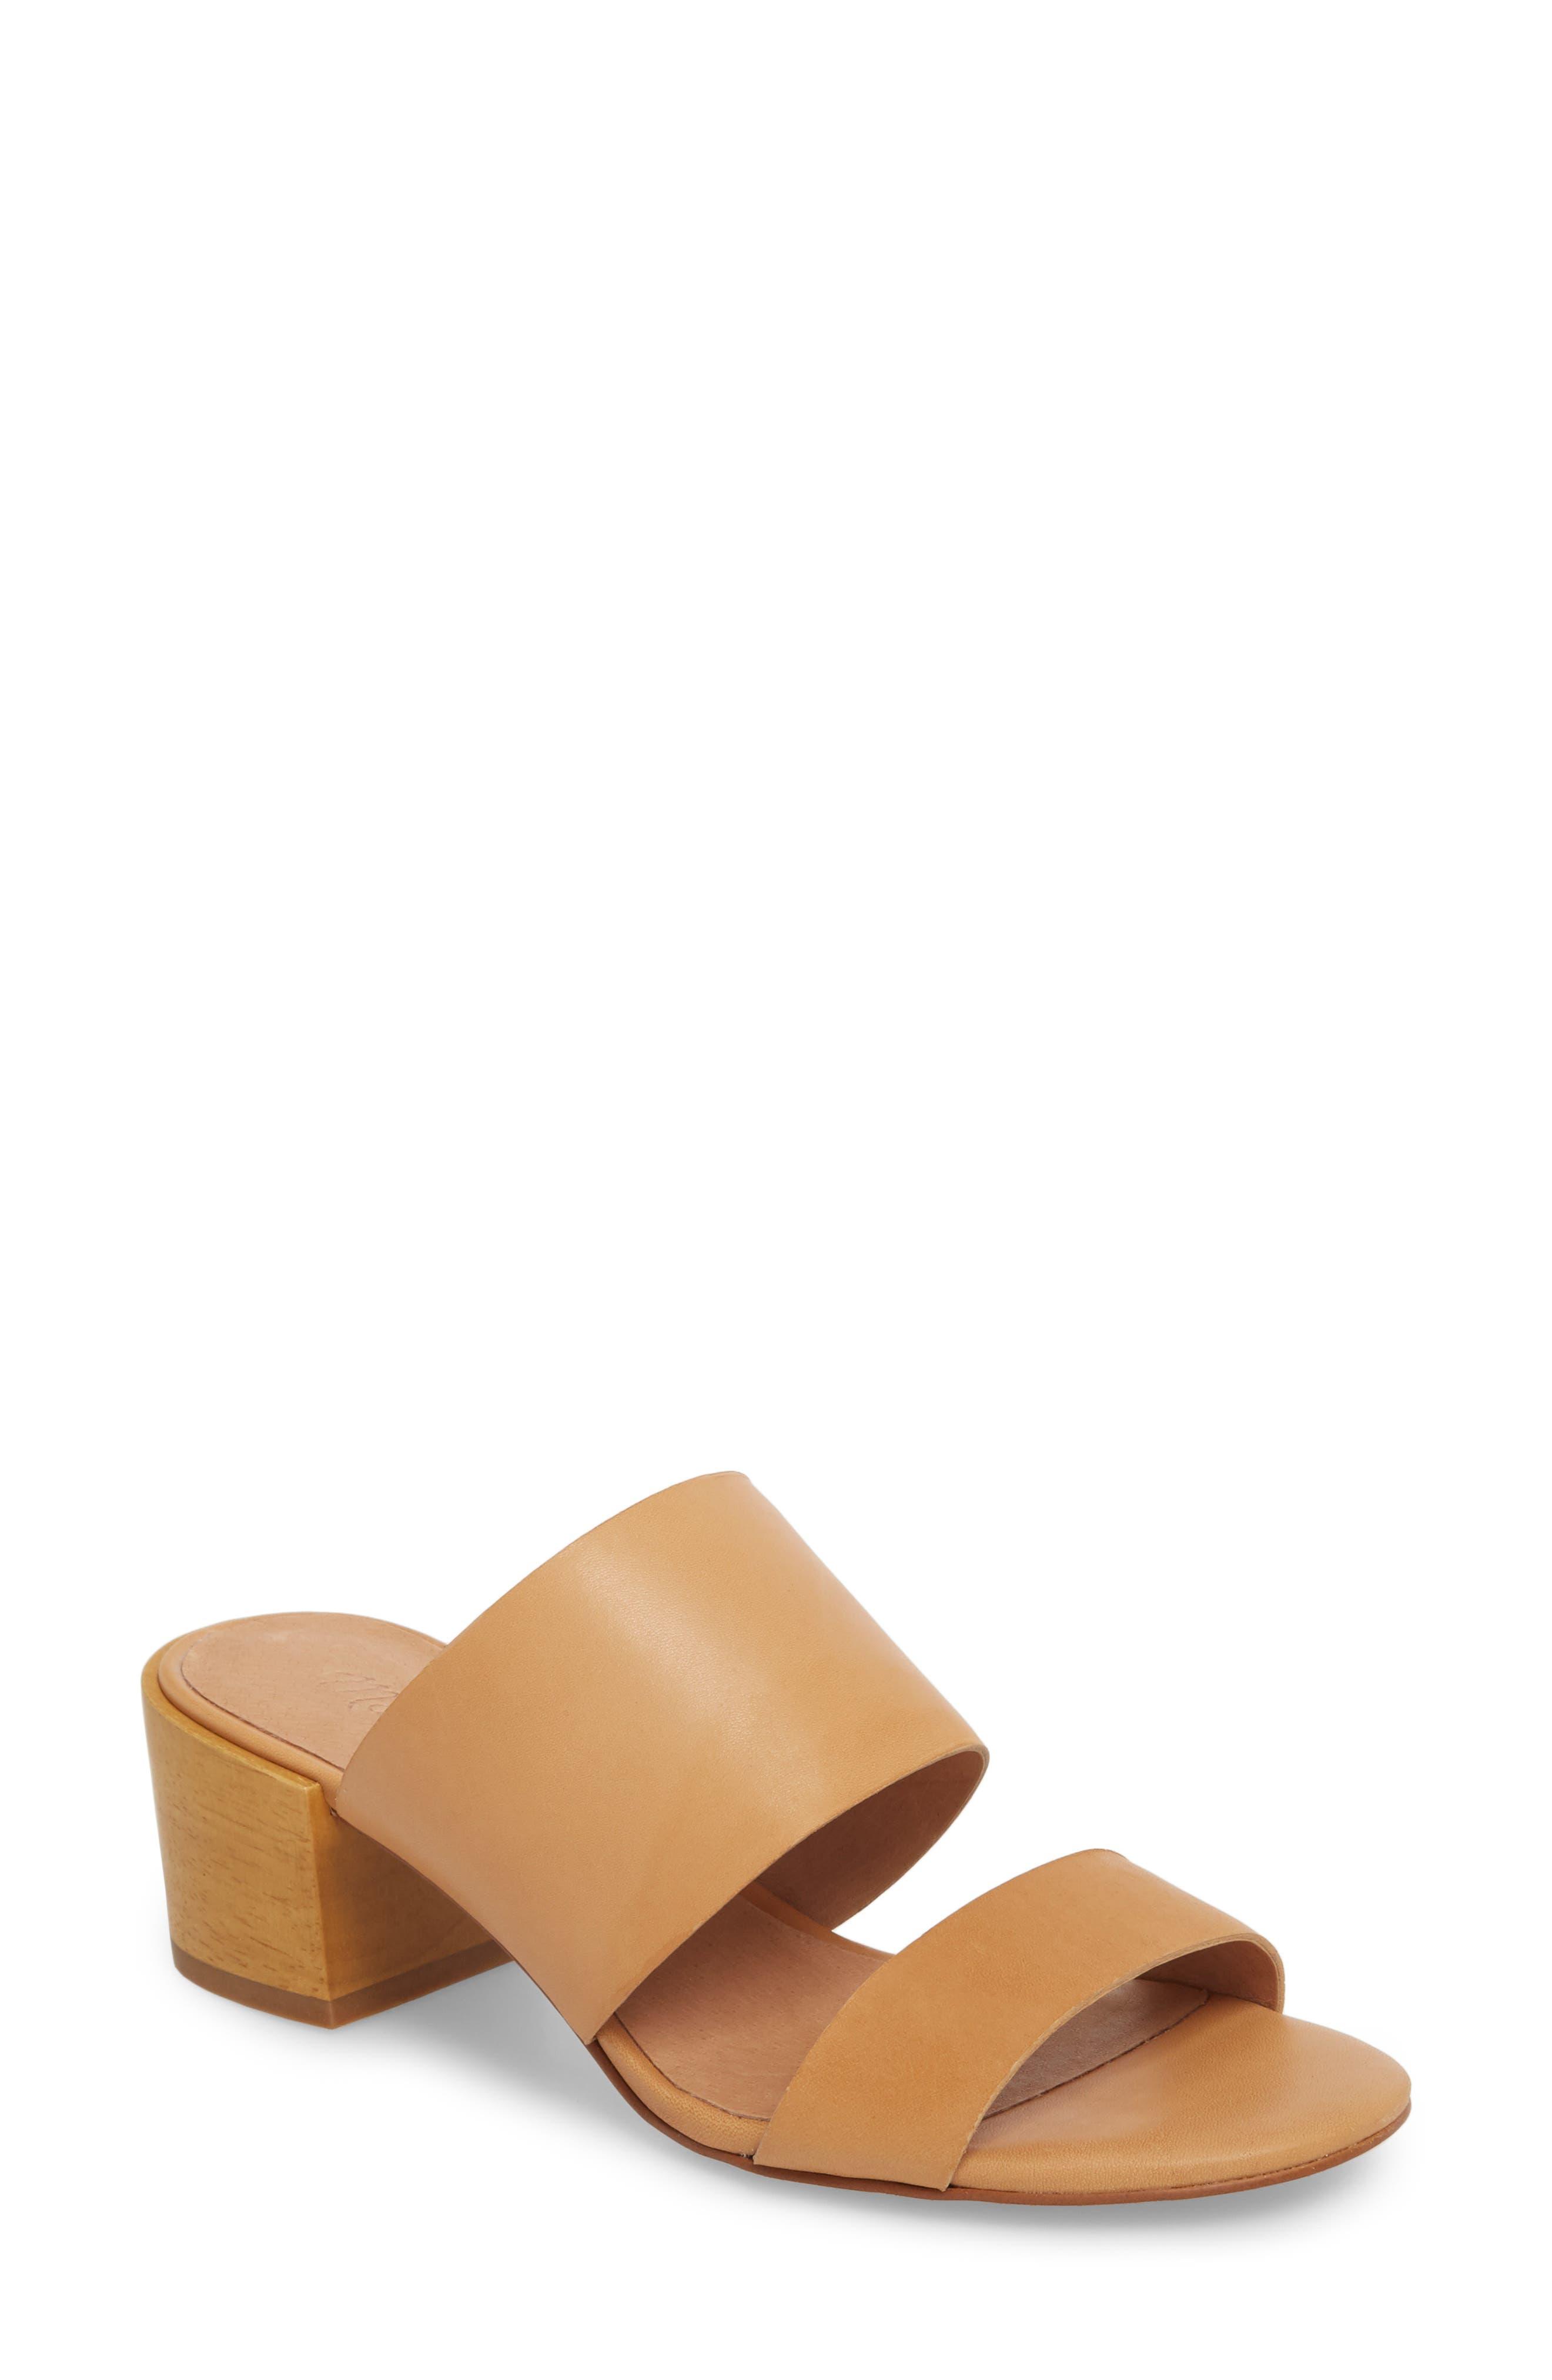 Kiera Block Heel Slide,                             Main thumbnail 2, color,